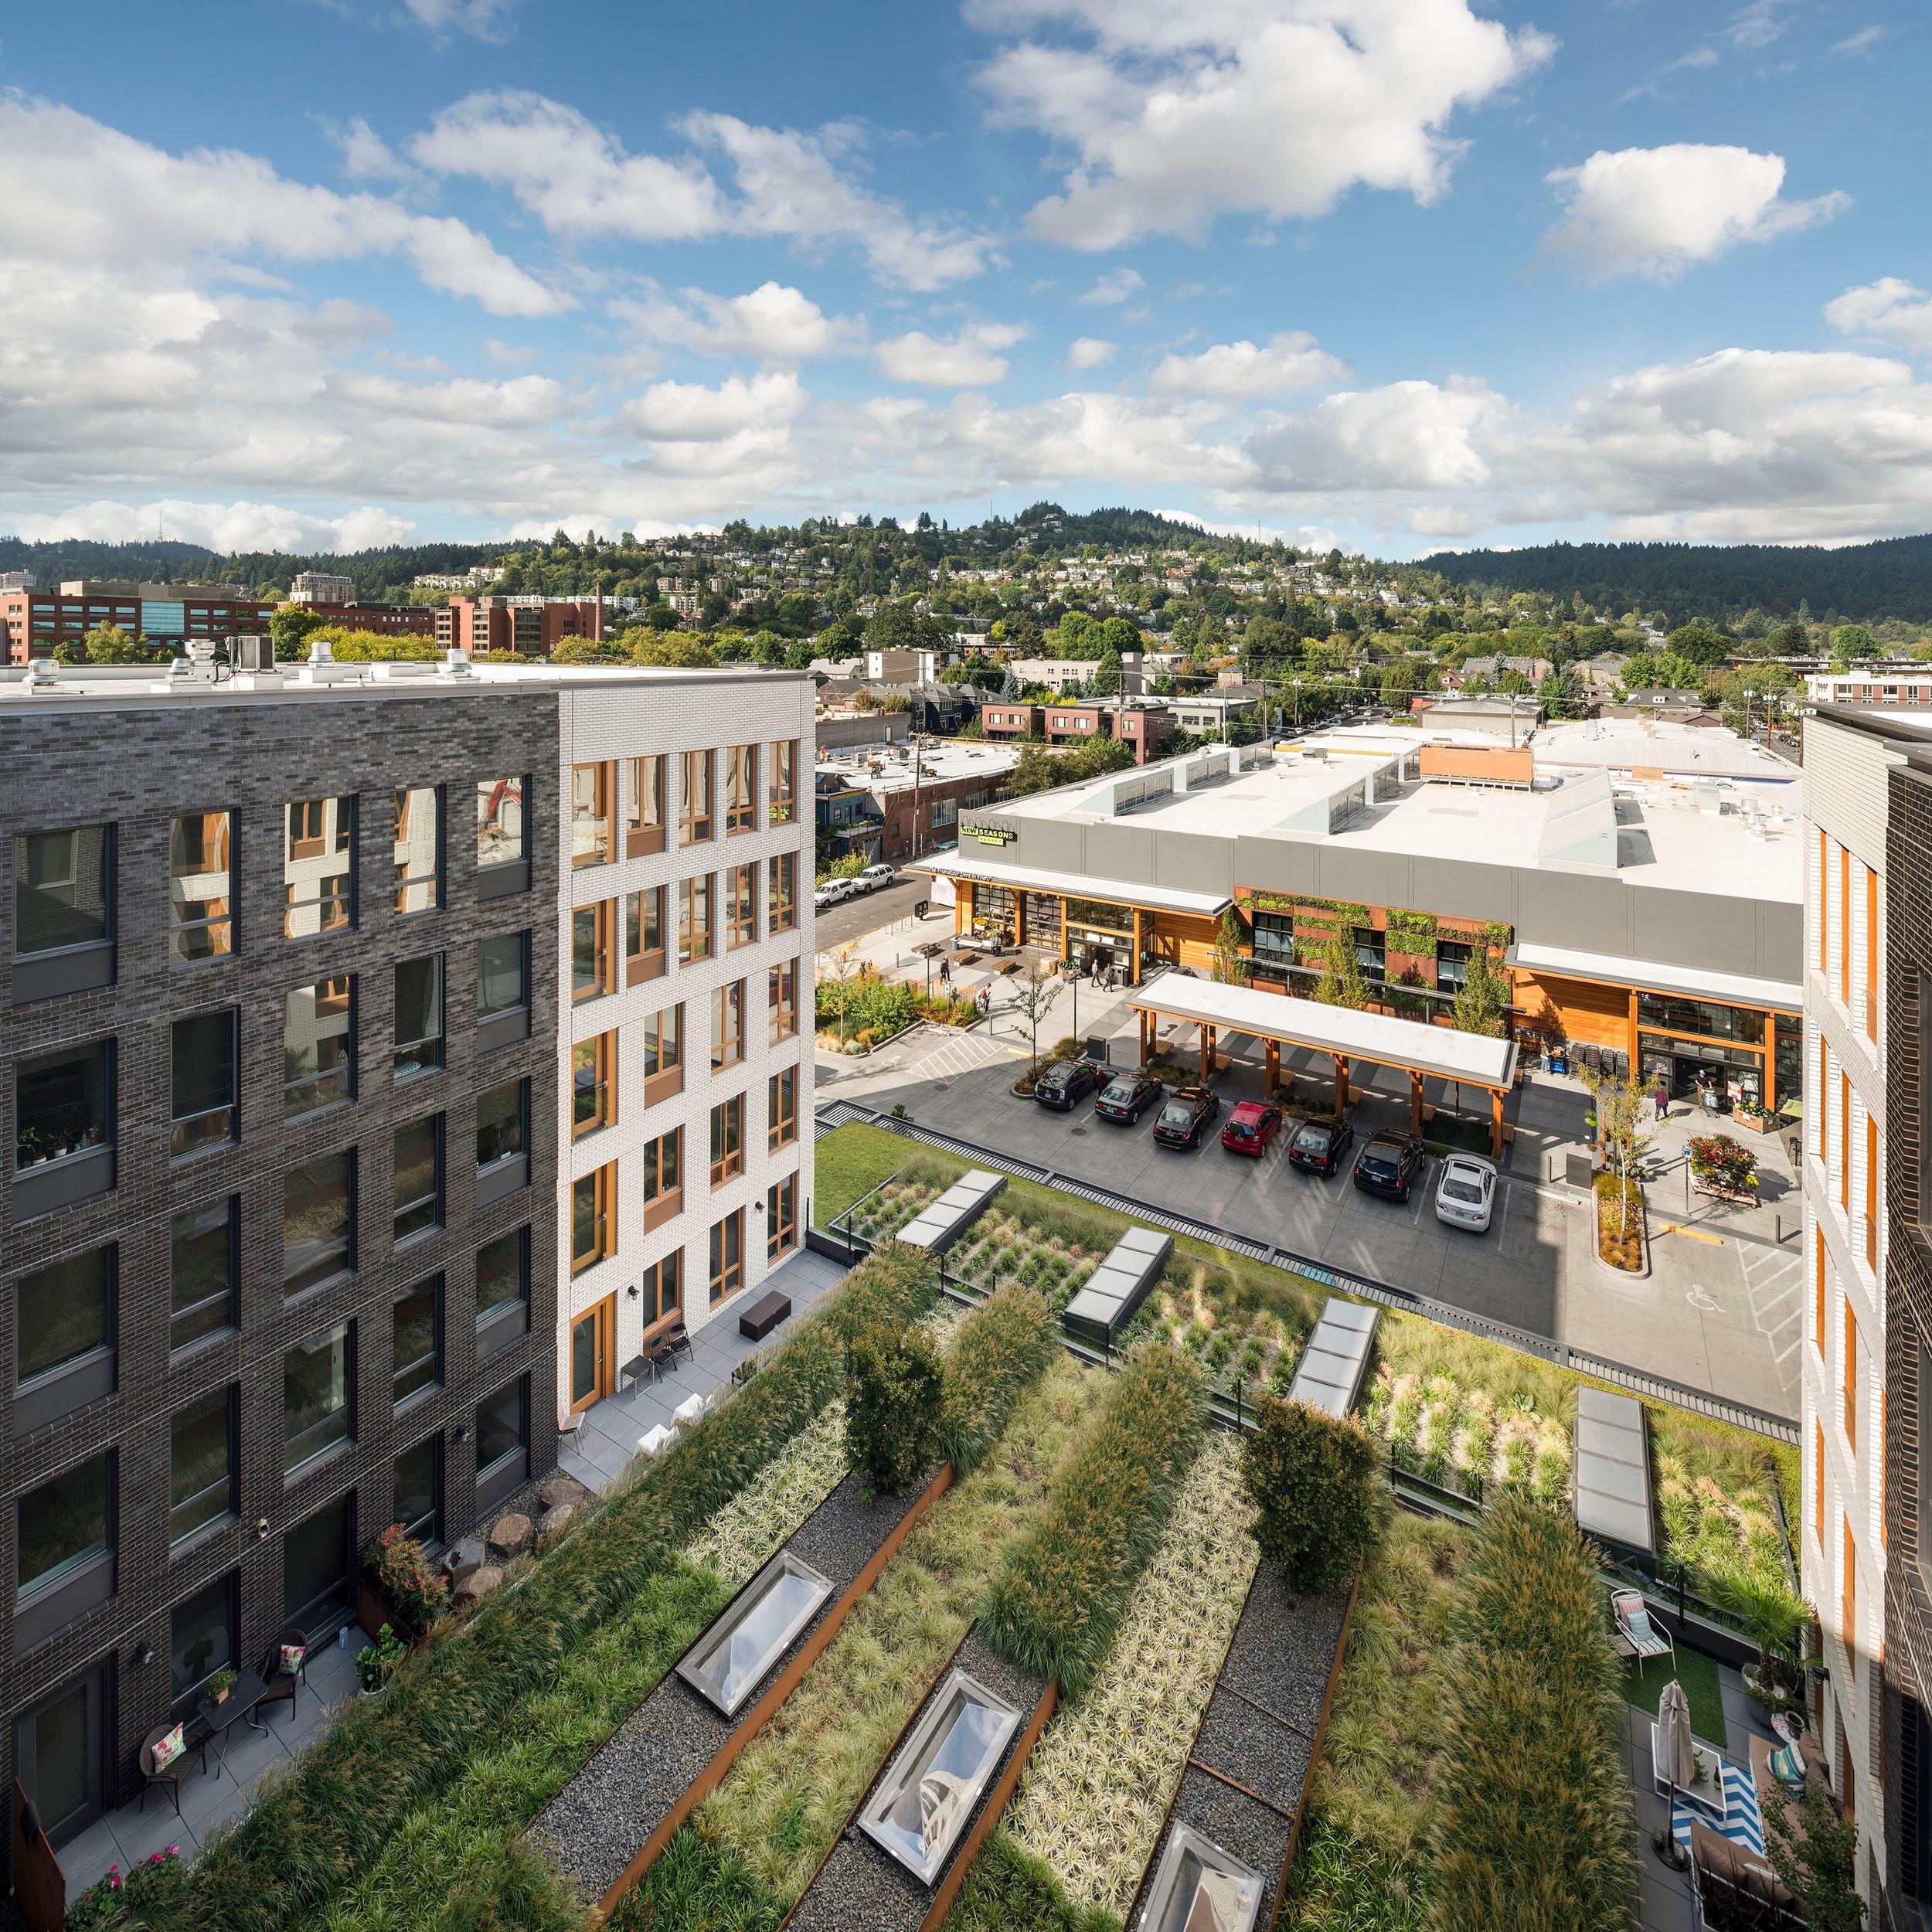 LL Hawkins Slabtown Marketplace - Lango Hansen Landscape Architects